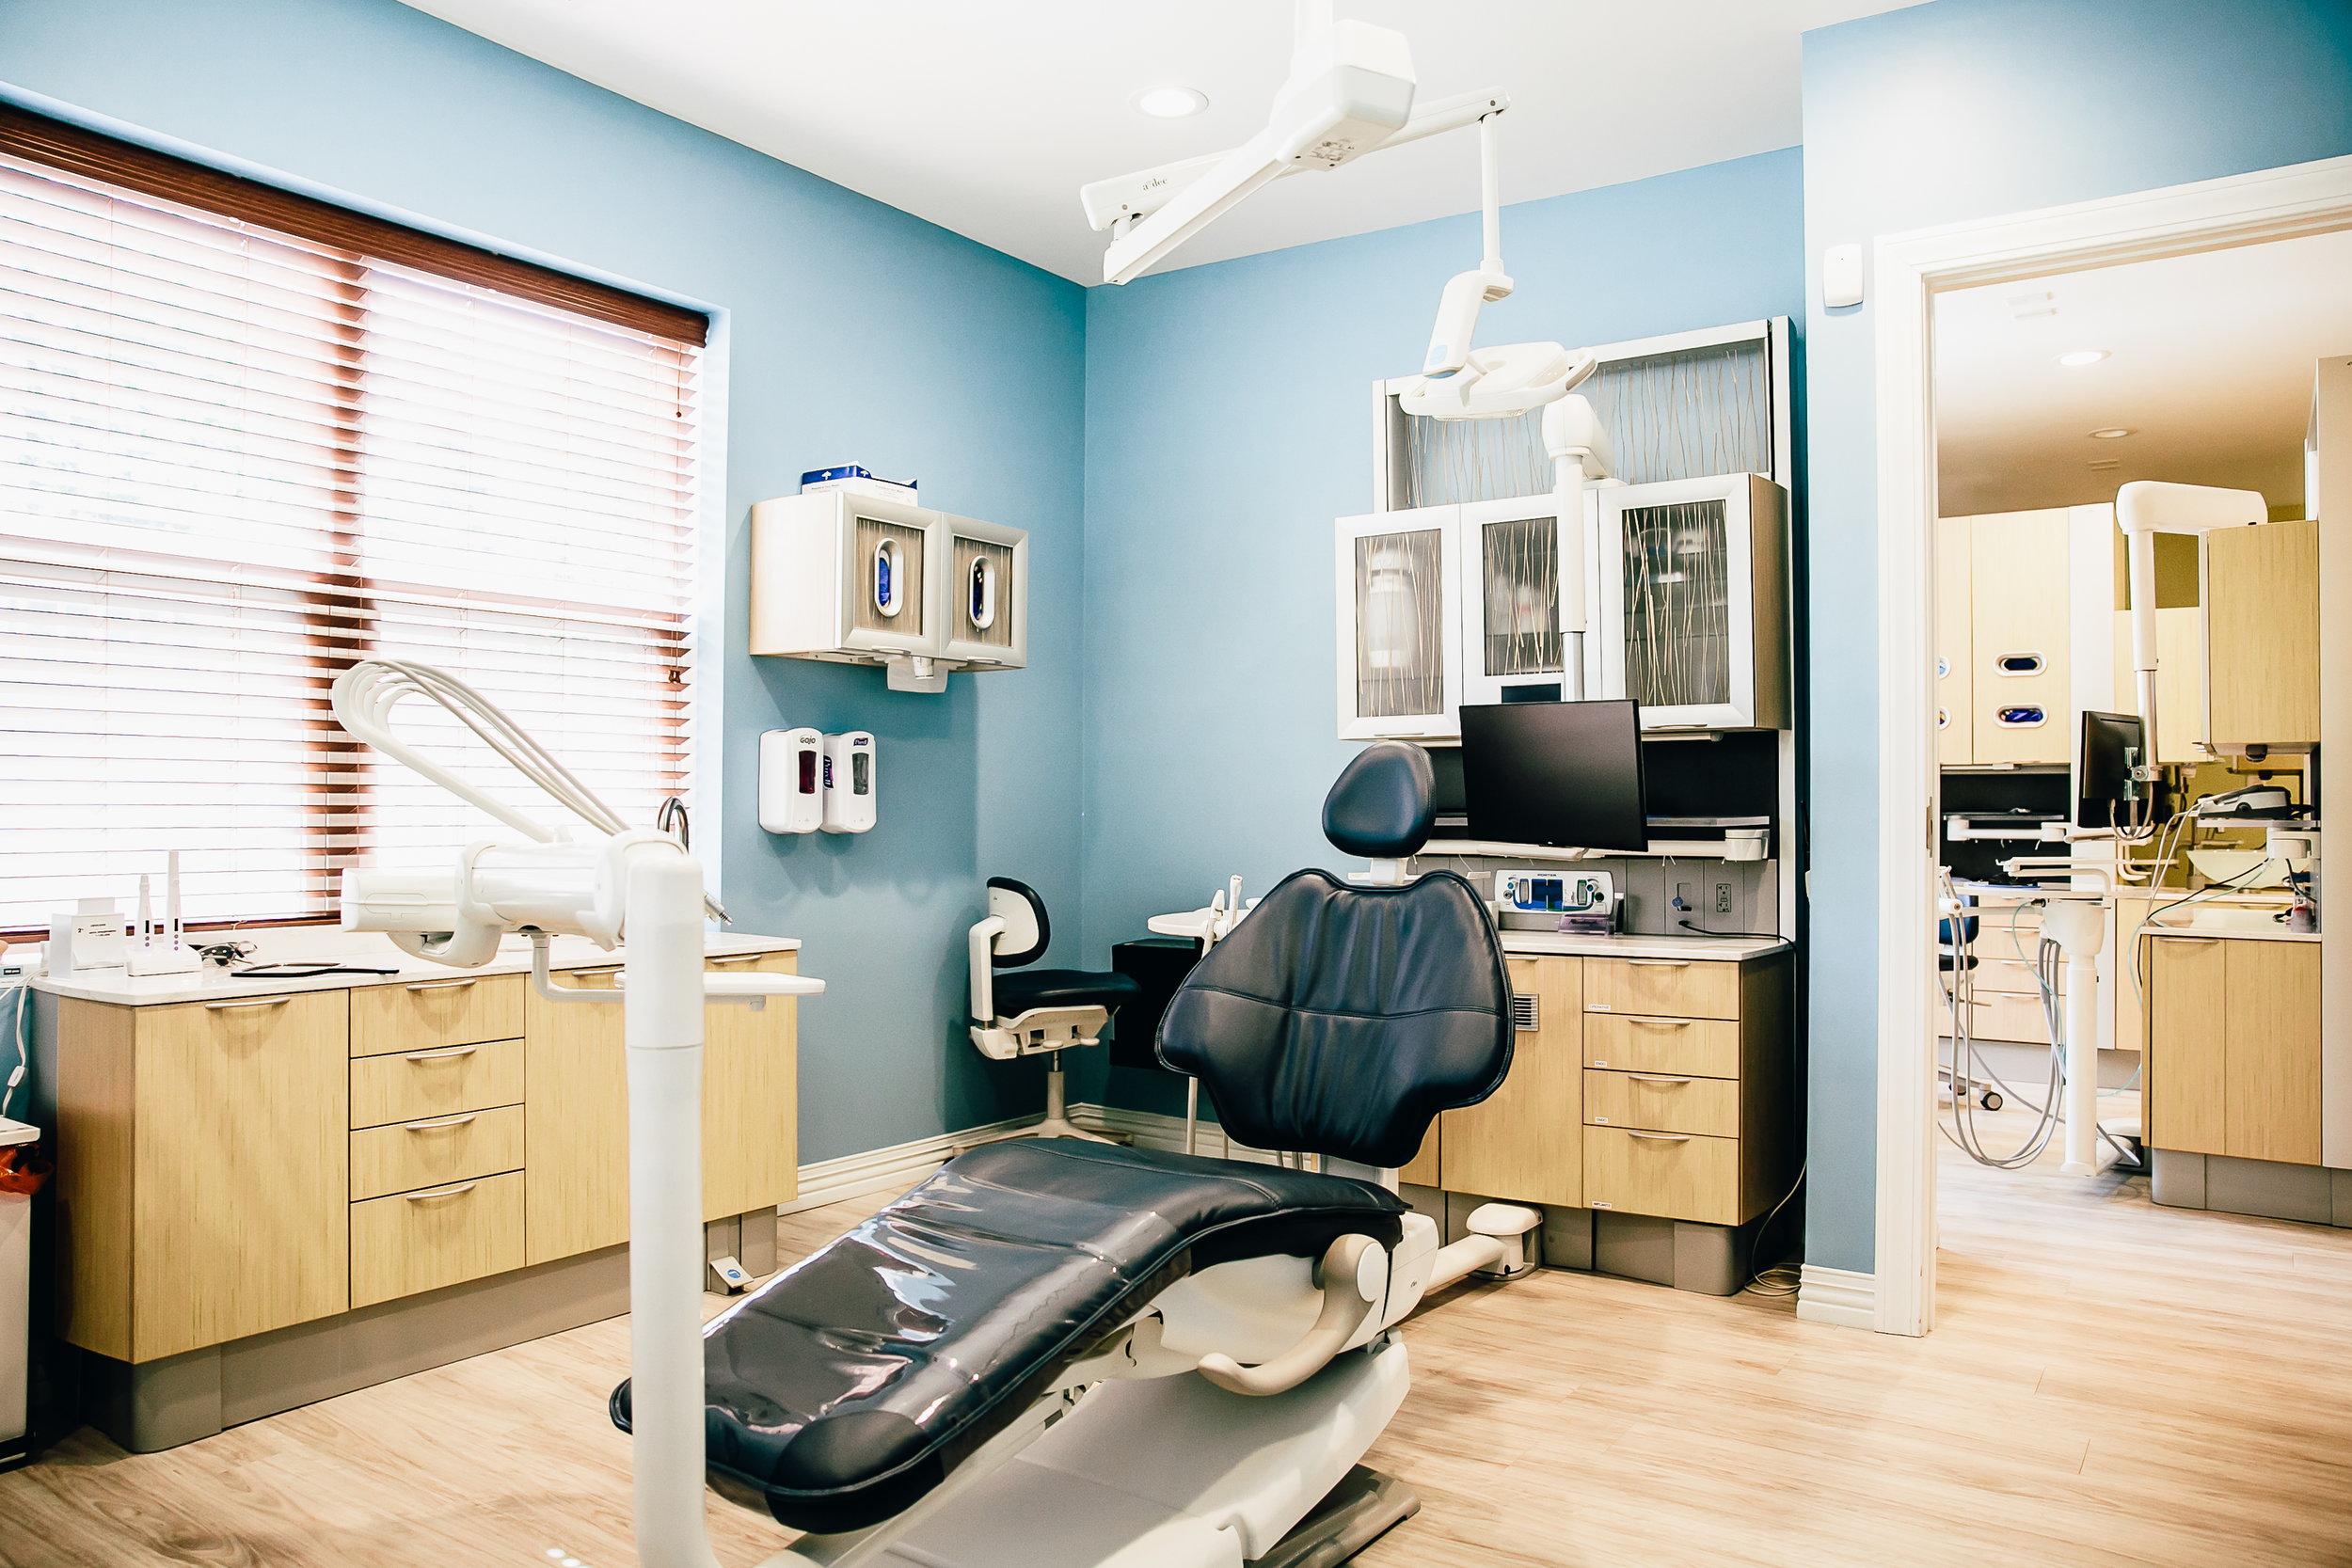 springsvillage_family_dentistry-16.jpg